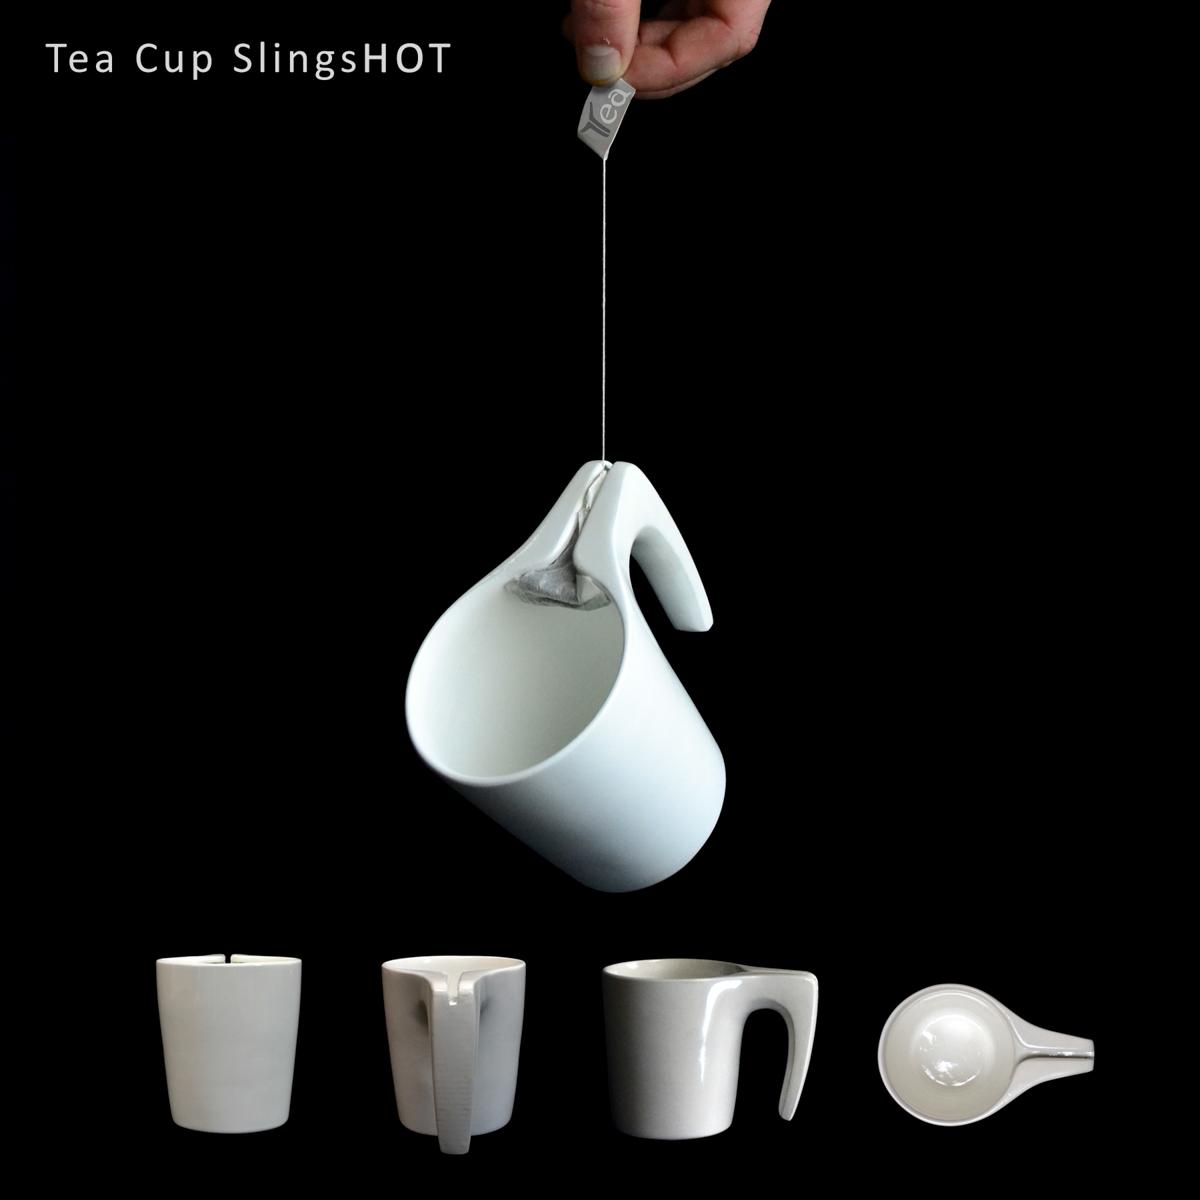 Samir-Sufi-Tea-Cup-SlingsHOT-2 (1).jpg